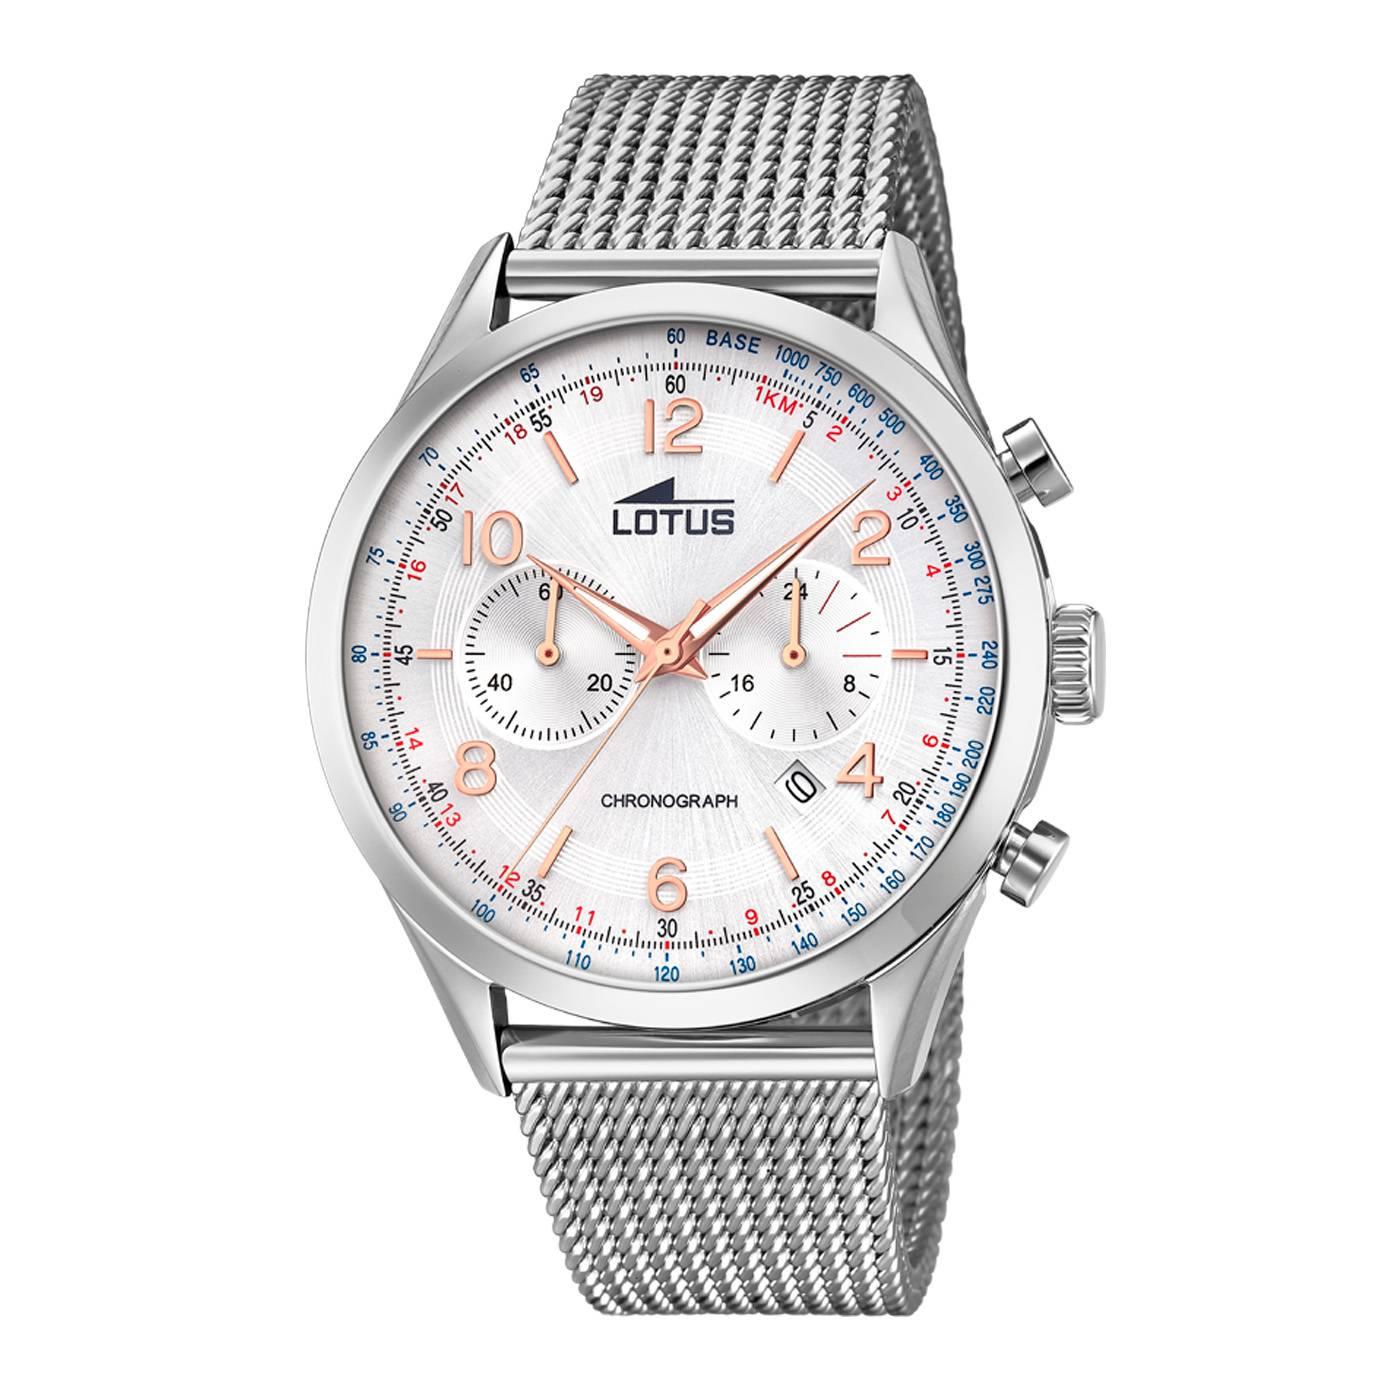 4742726a41c1 Reloj Lotus Smart Casual cronografo Hombre 18555/1